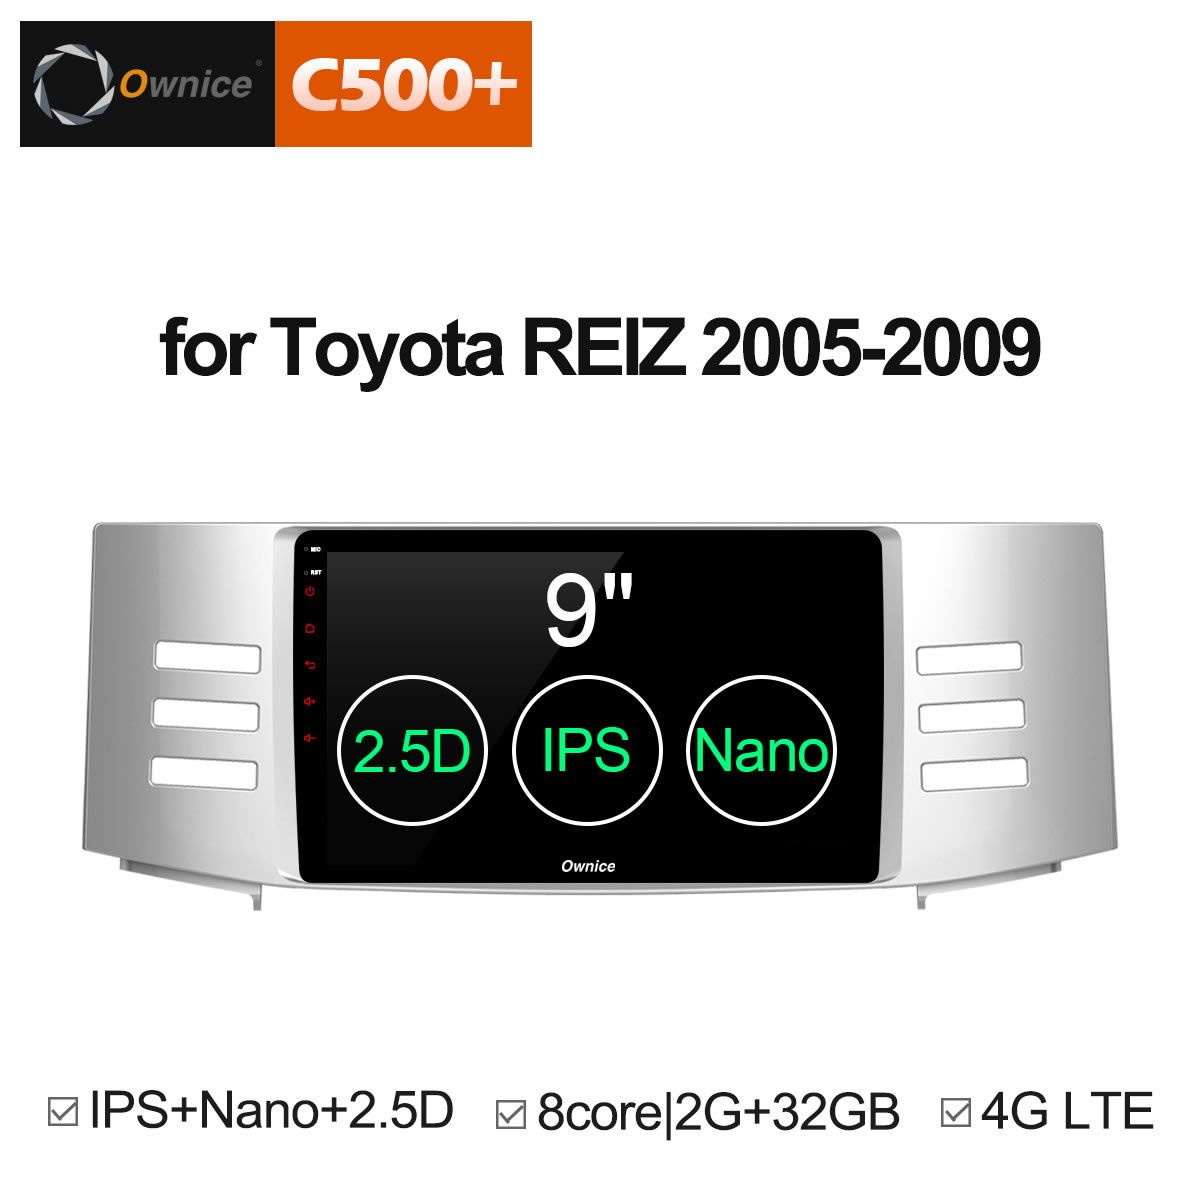 Ownice C500 + G10 Android 8.1 8 Core Auto GPS Navi Für Toyota Reiz Mark X 2005 2006 2007 2008 2009 radio DVD-Player 4g SIM Karte